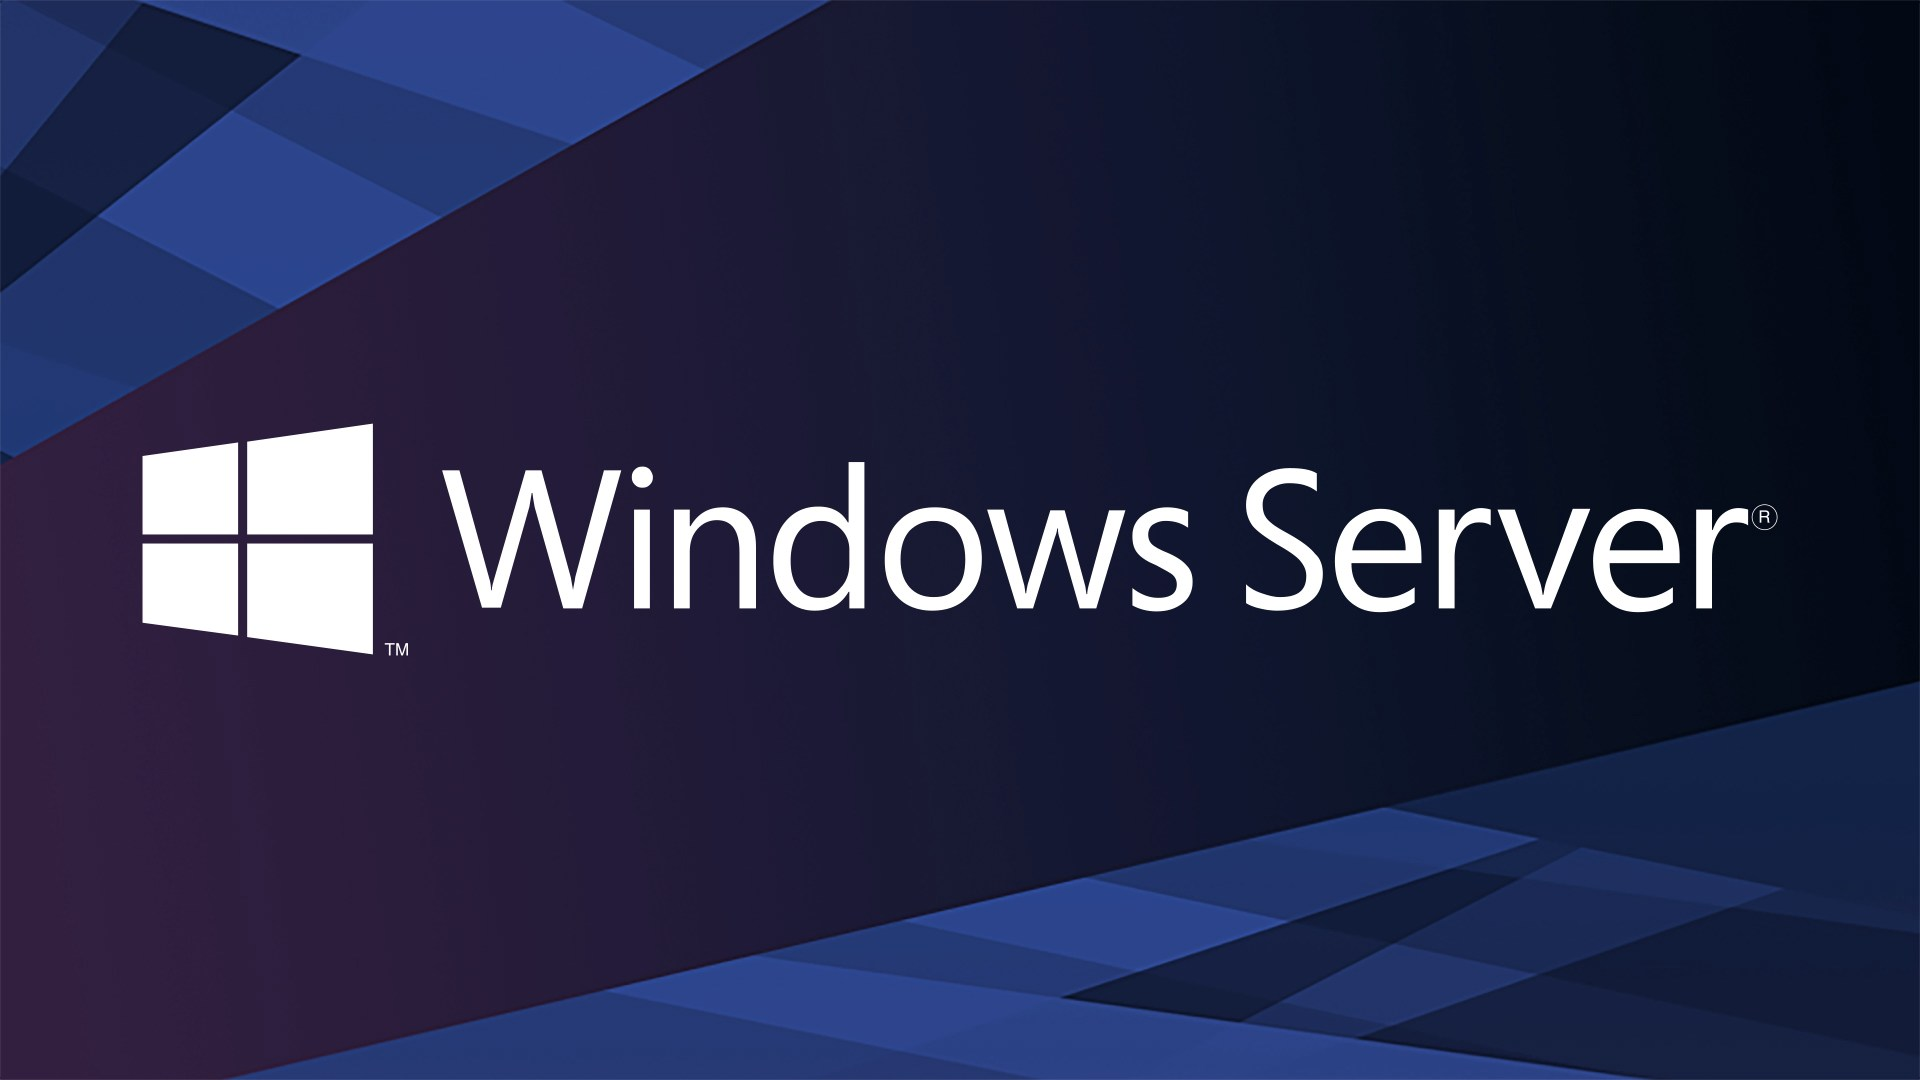 Microsoft, Betriebssystem, Windows, Server, Windows Server, Windows Server 2016, Windows Server 2019, Windows Server 2021, Windows Server 2022, Windows Server 2023